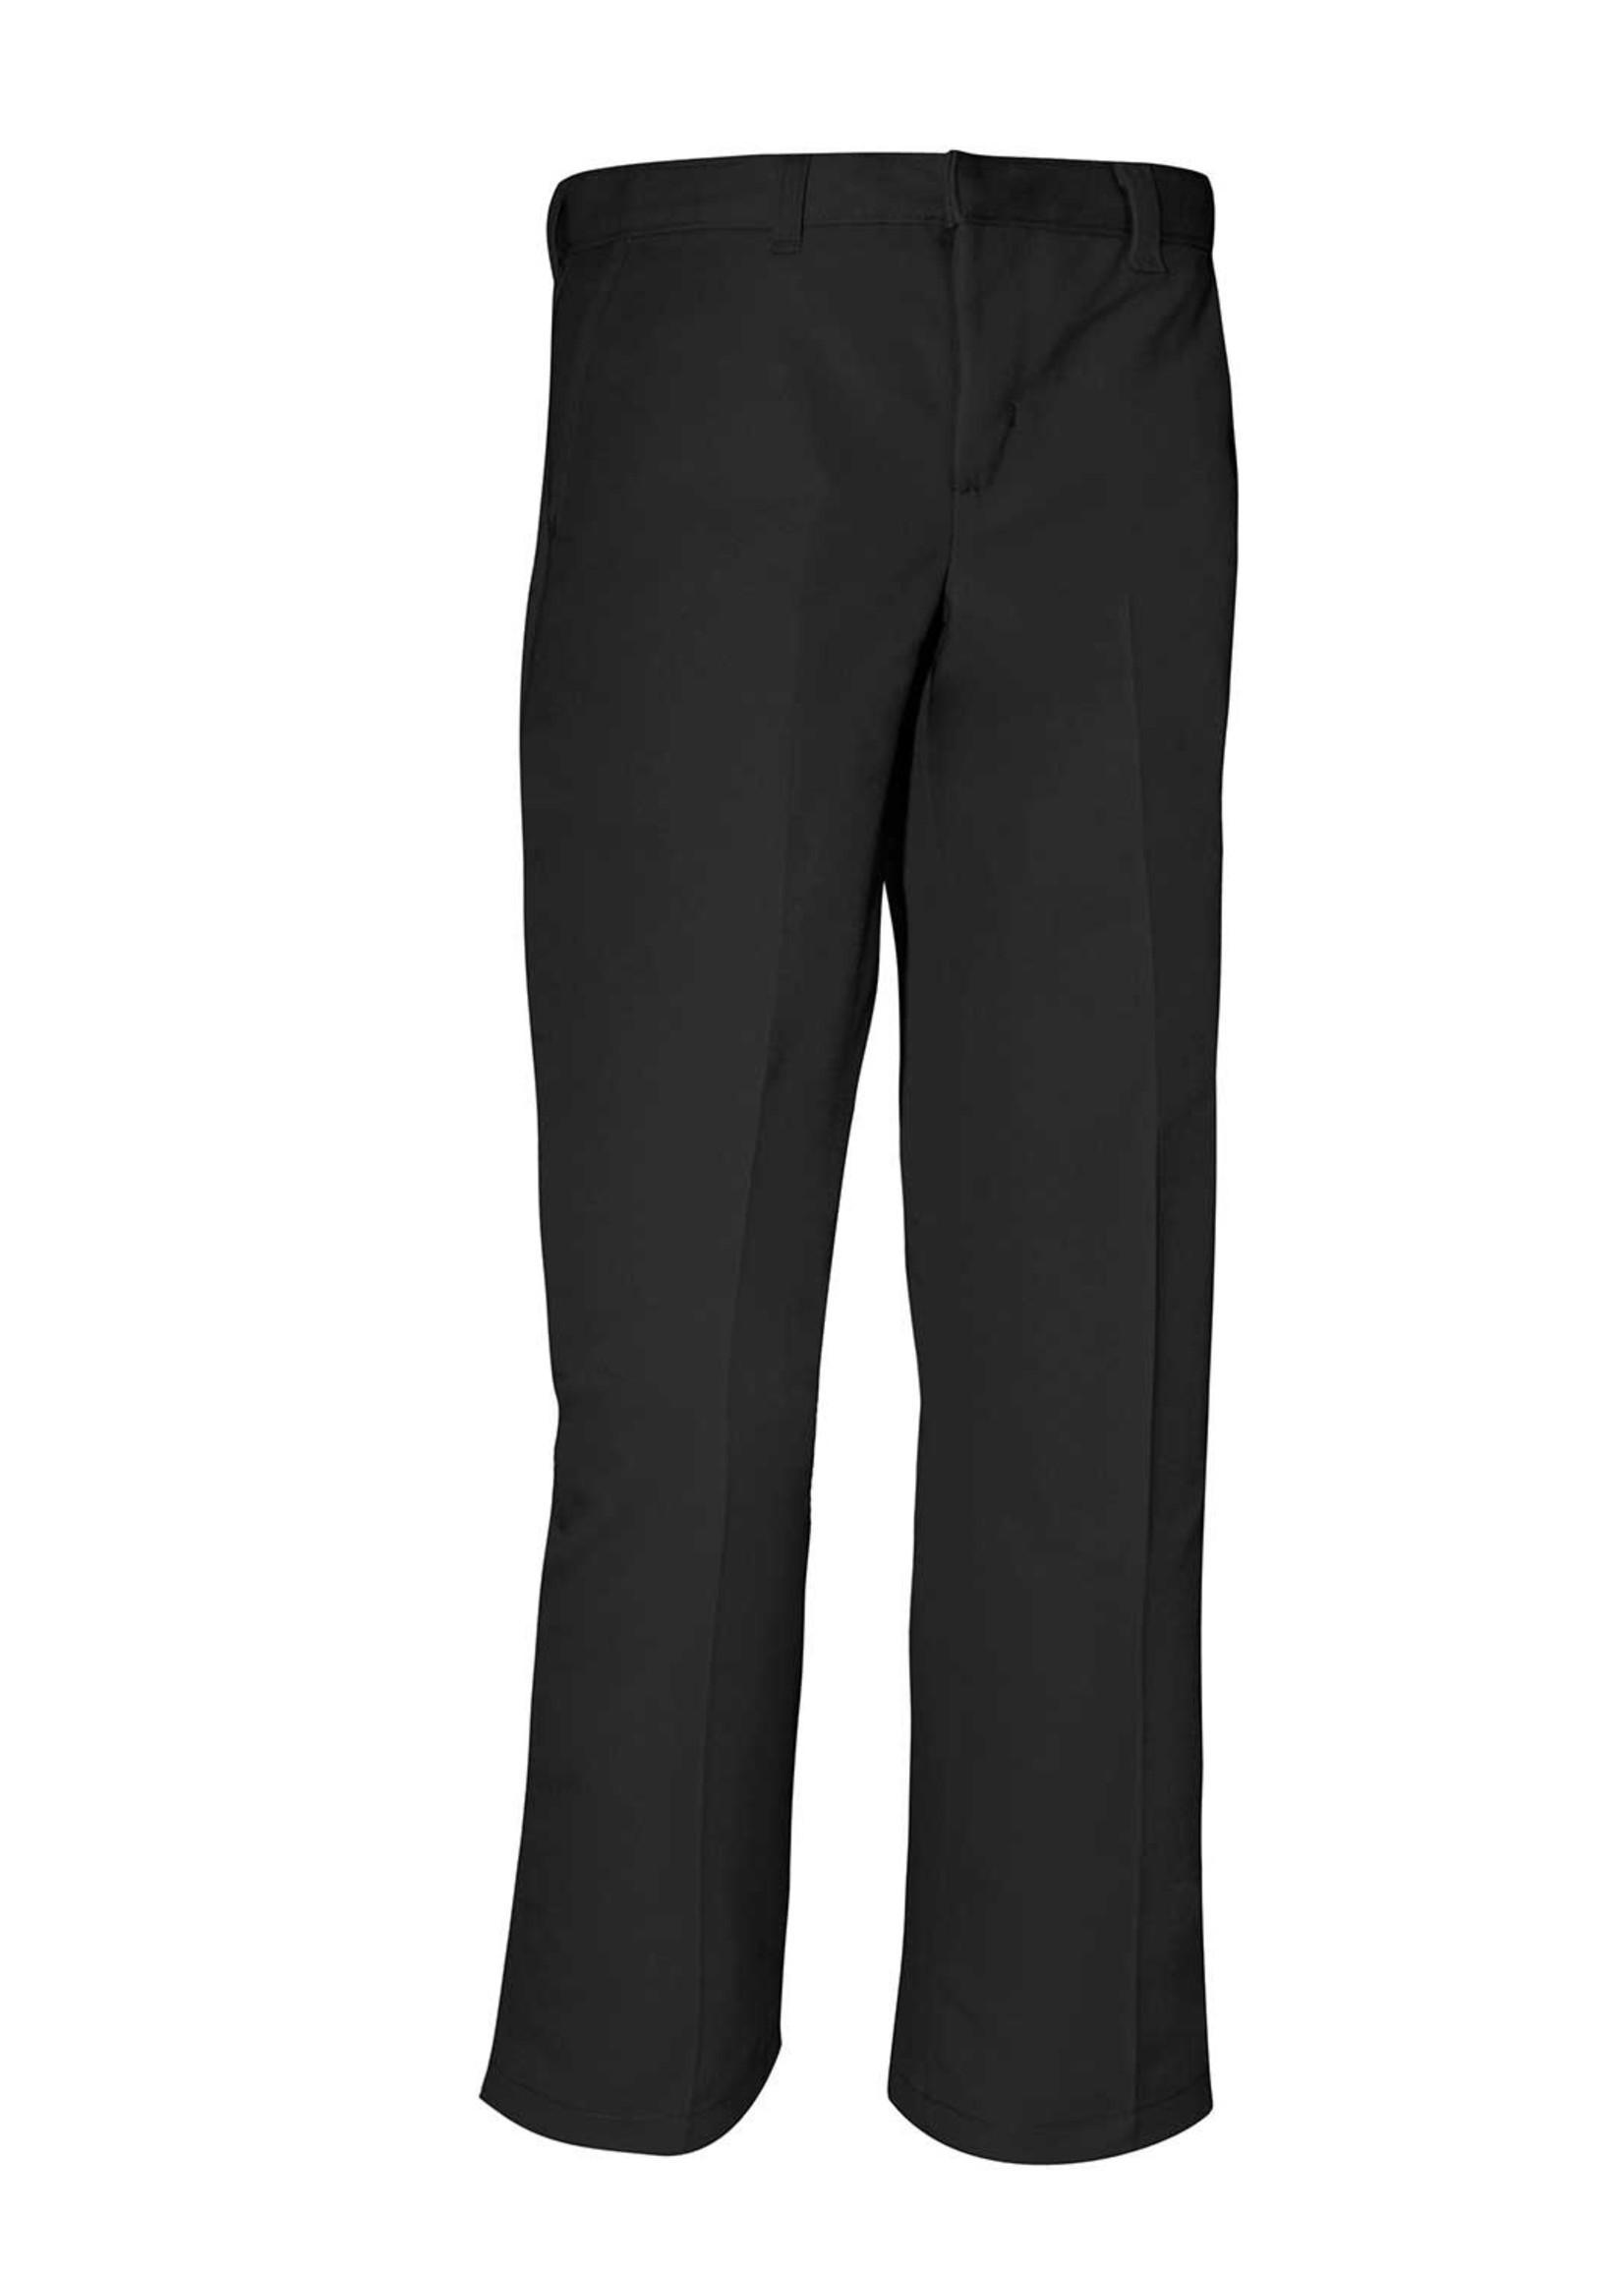 CLS Boys Black Flat Front Pants